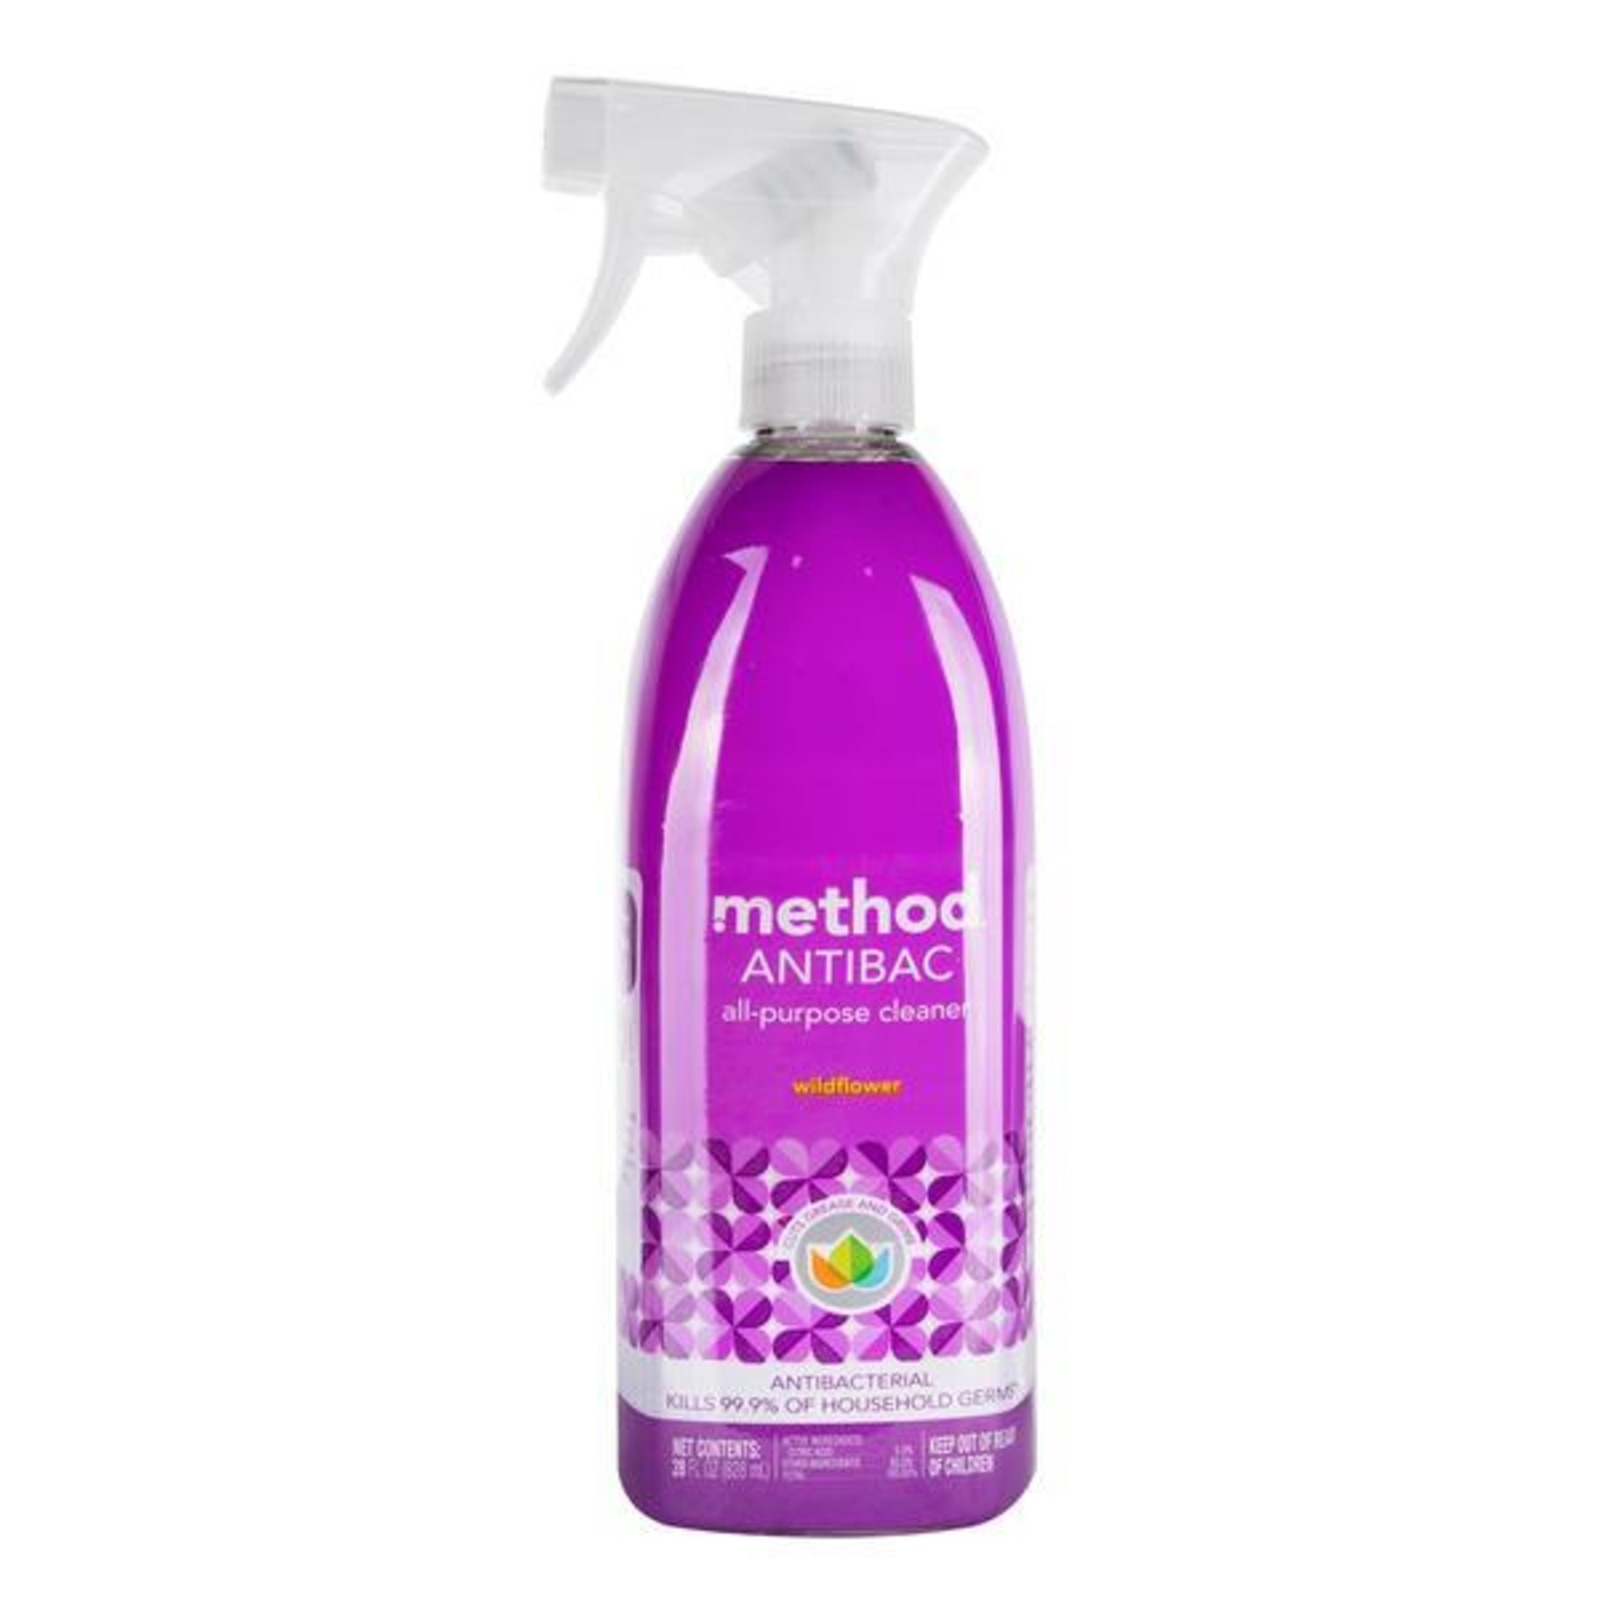 Method Antibac All-Purpose Cleaner - Wildflower